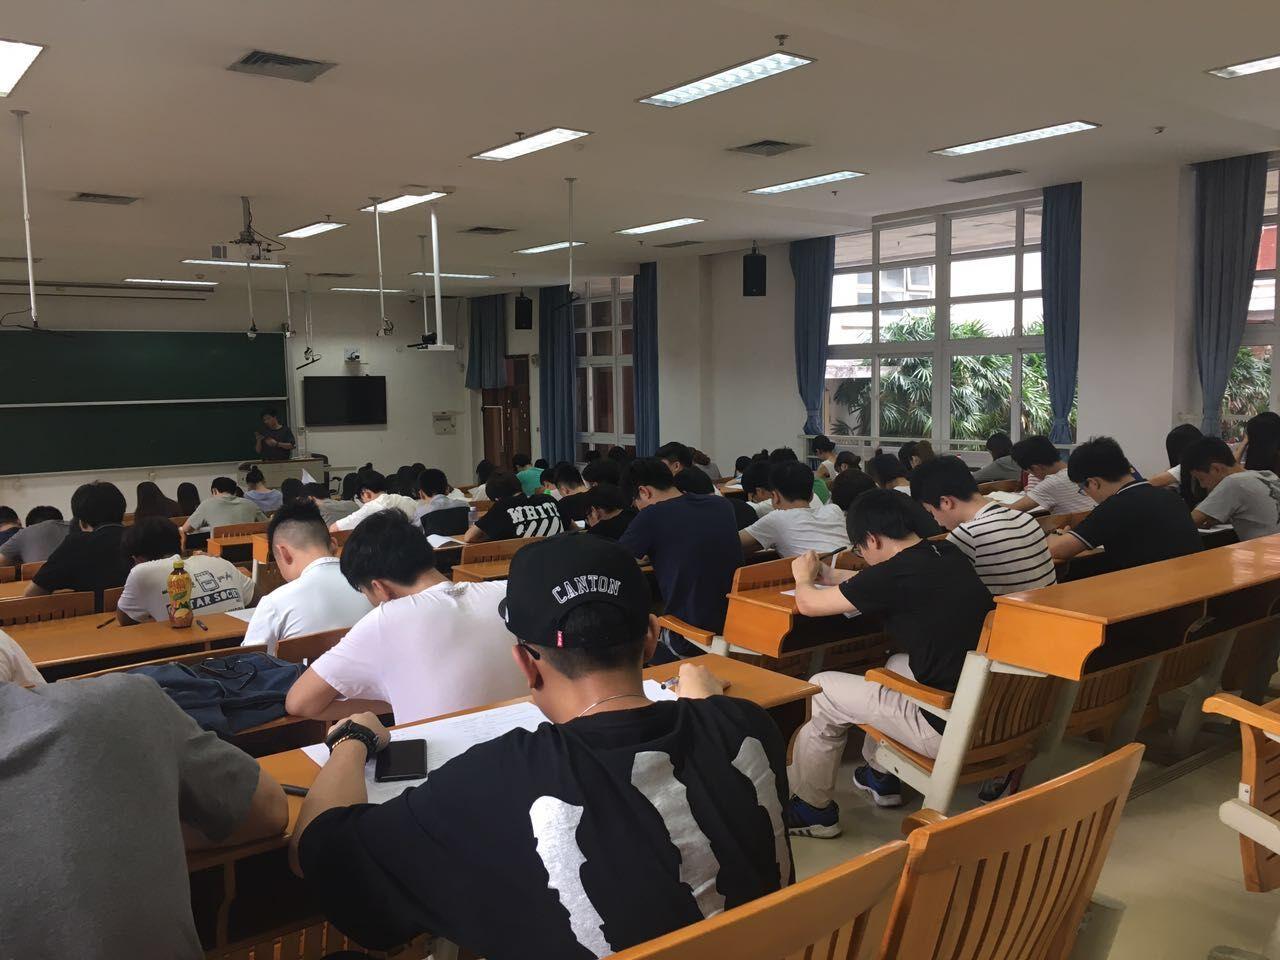 广州java ee培训课程